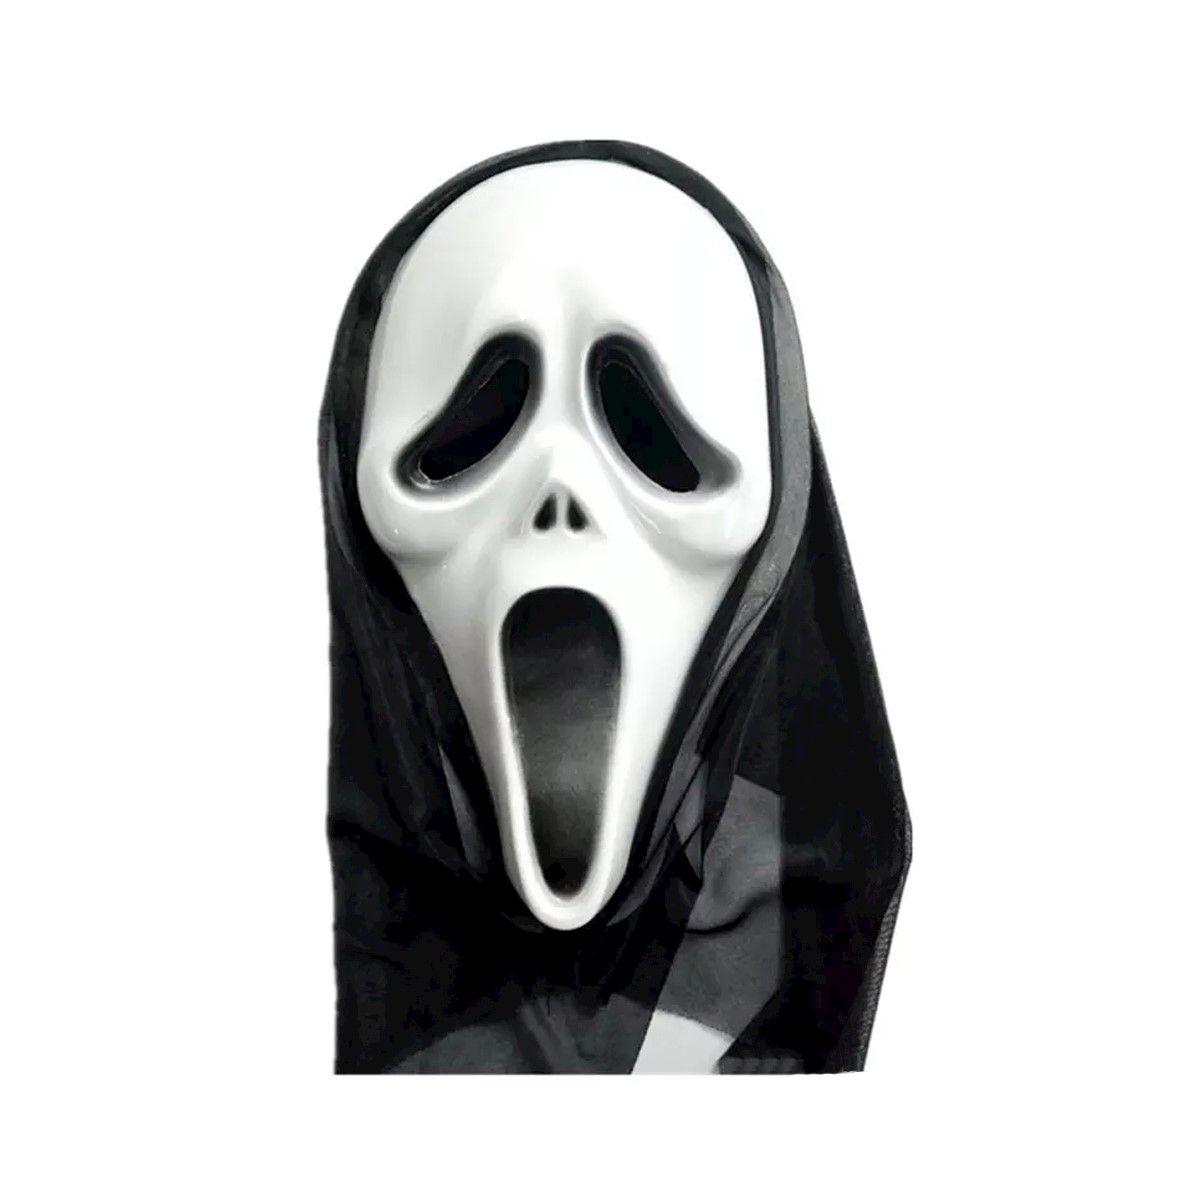 Mascara Para Fantasia Filme Panico Terror Carnaval